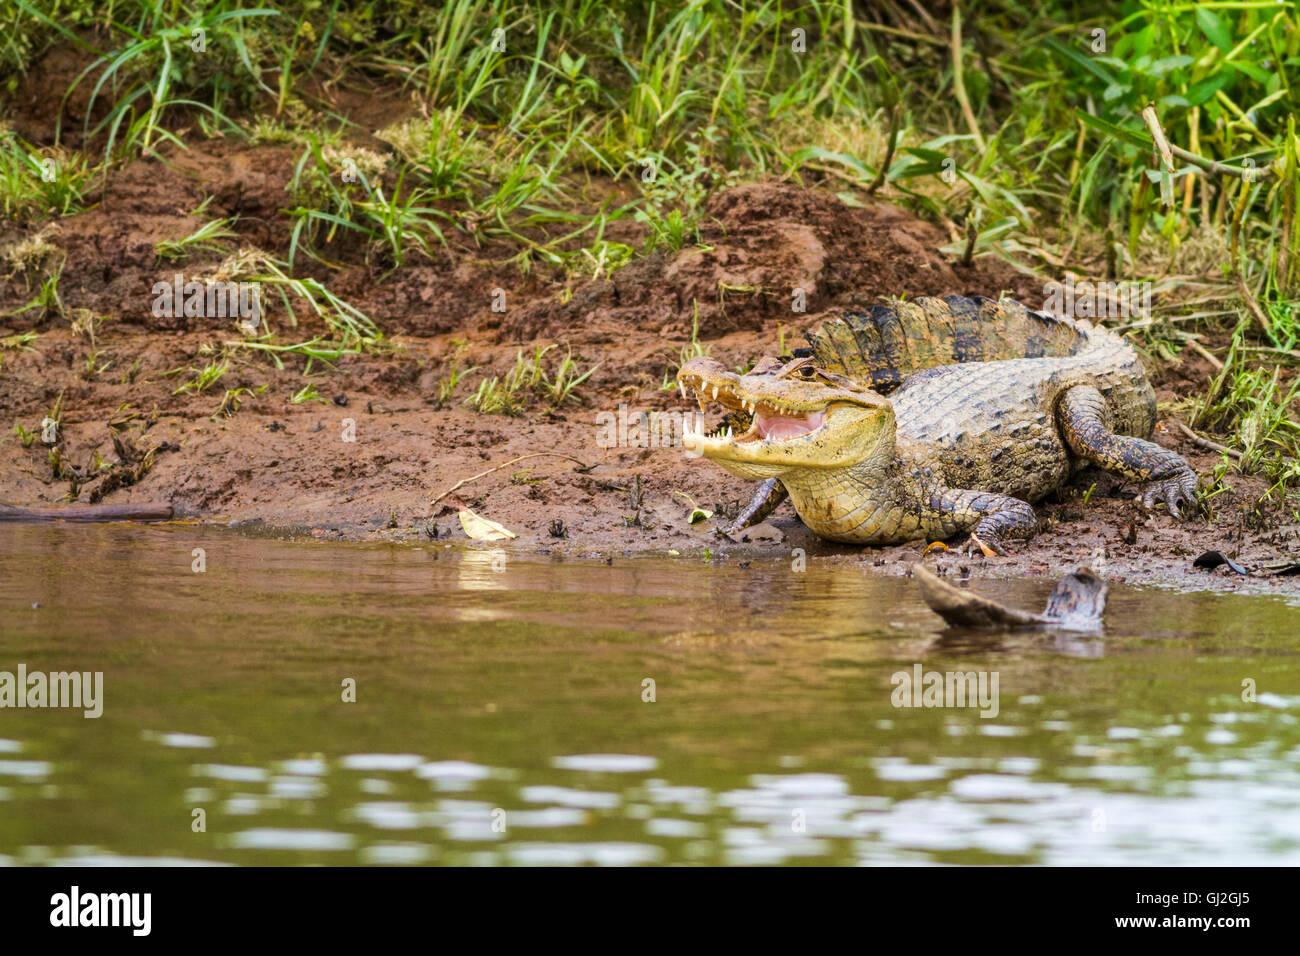 Cayman (Caiman crocodilus fuscus) , Cano Negro reserve, Alajuela, Costa Rica - Stock Image